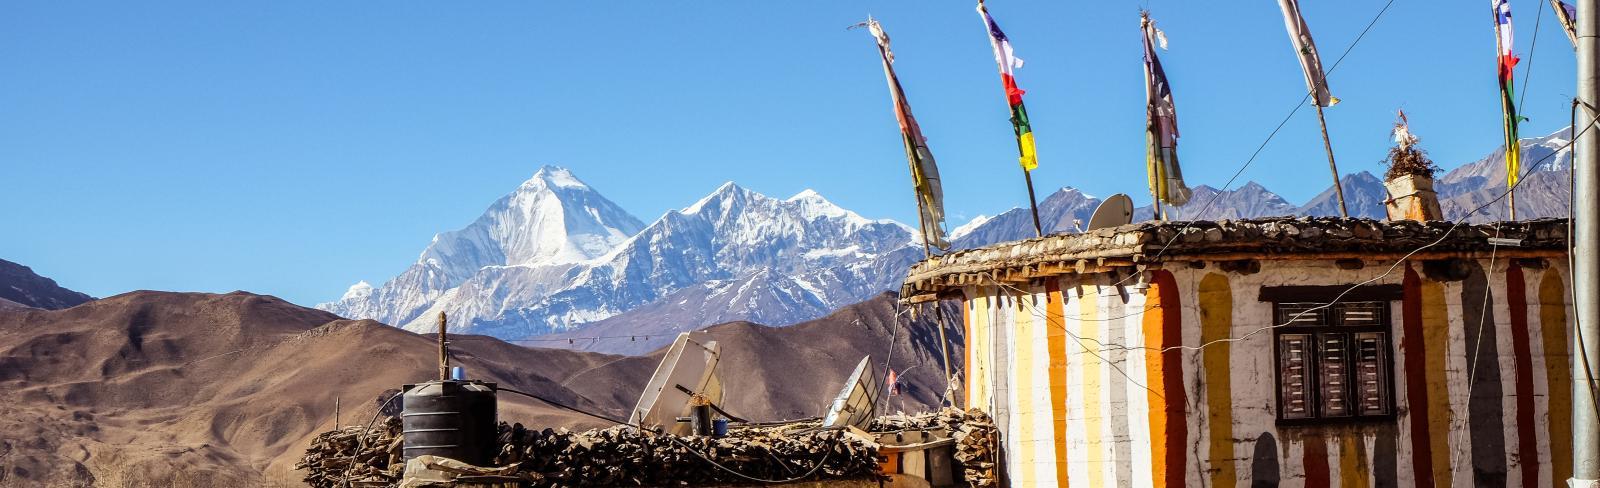 istock, Nepal, rural